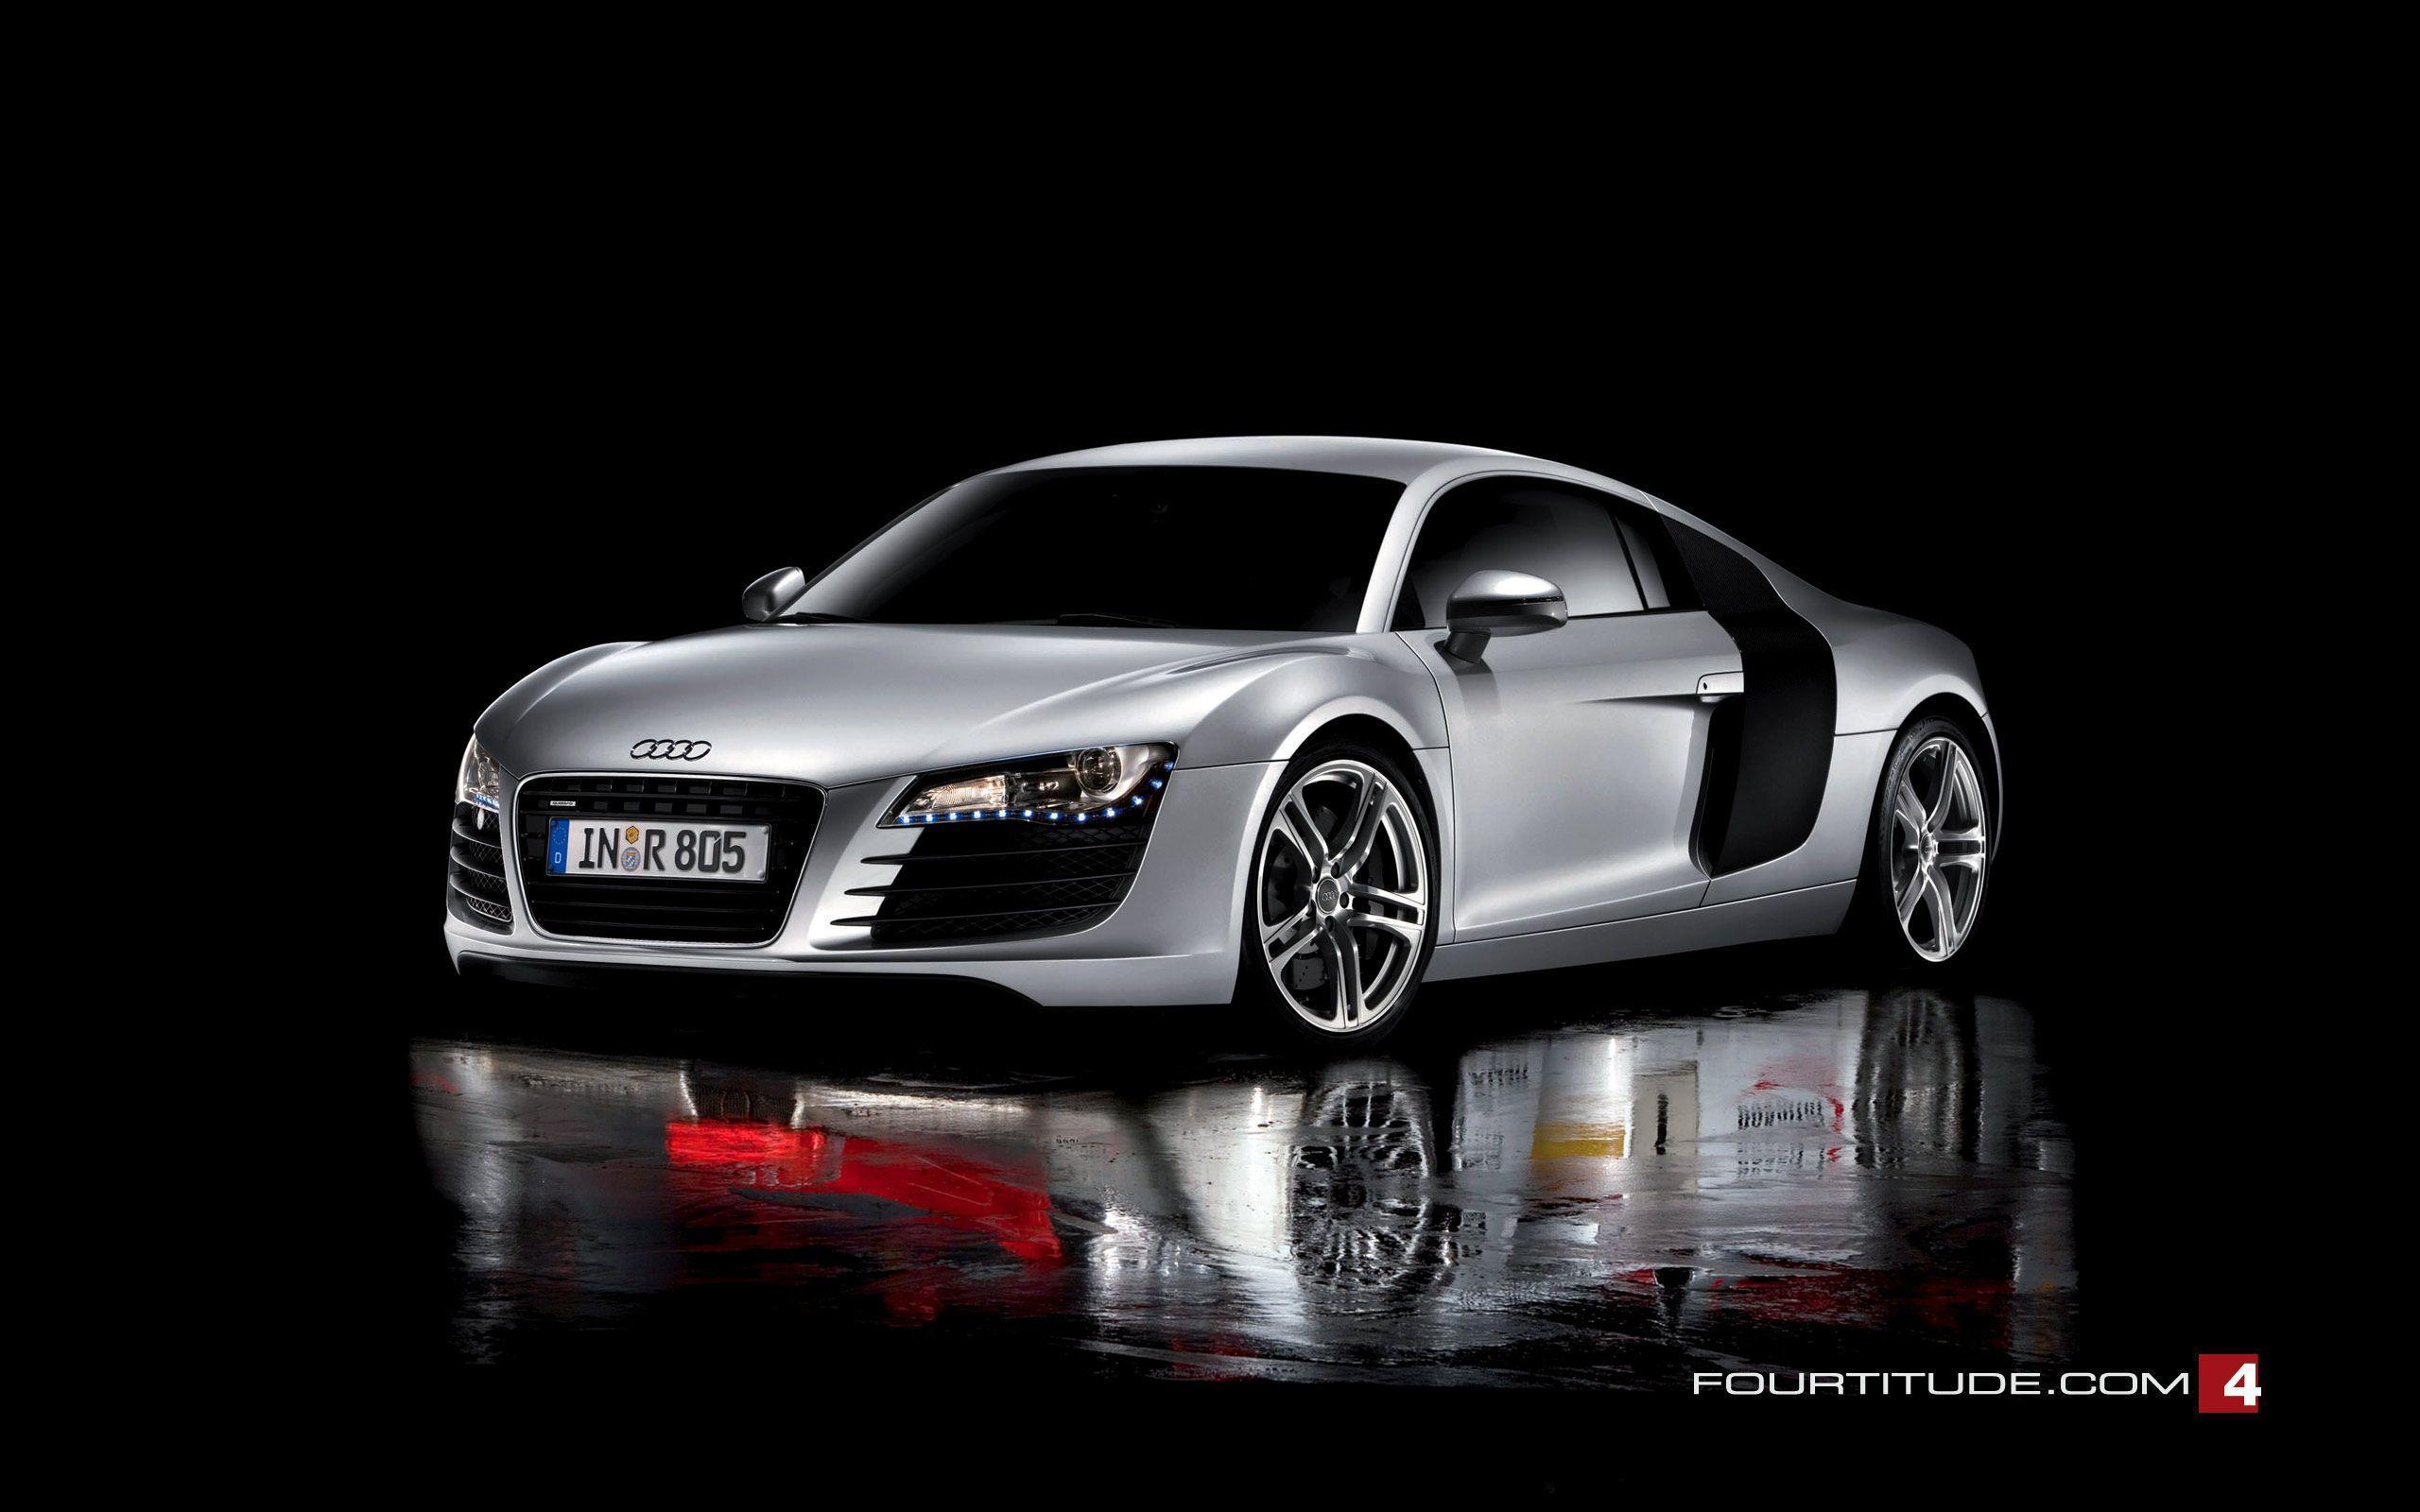 Audi R8 Hd Wallpapers Wallpaper Cave Images, Photos, Reviews